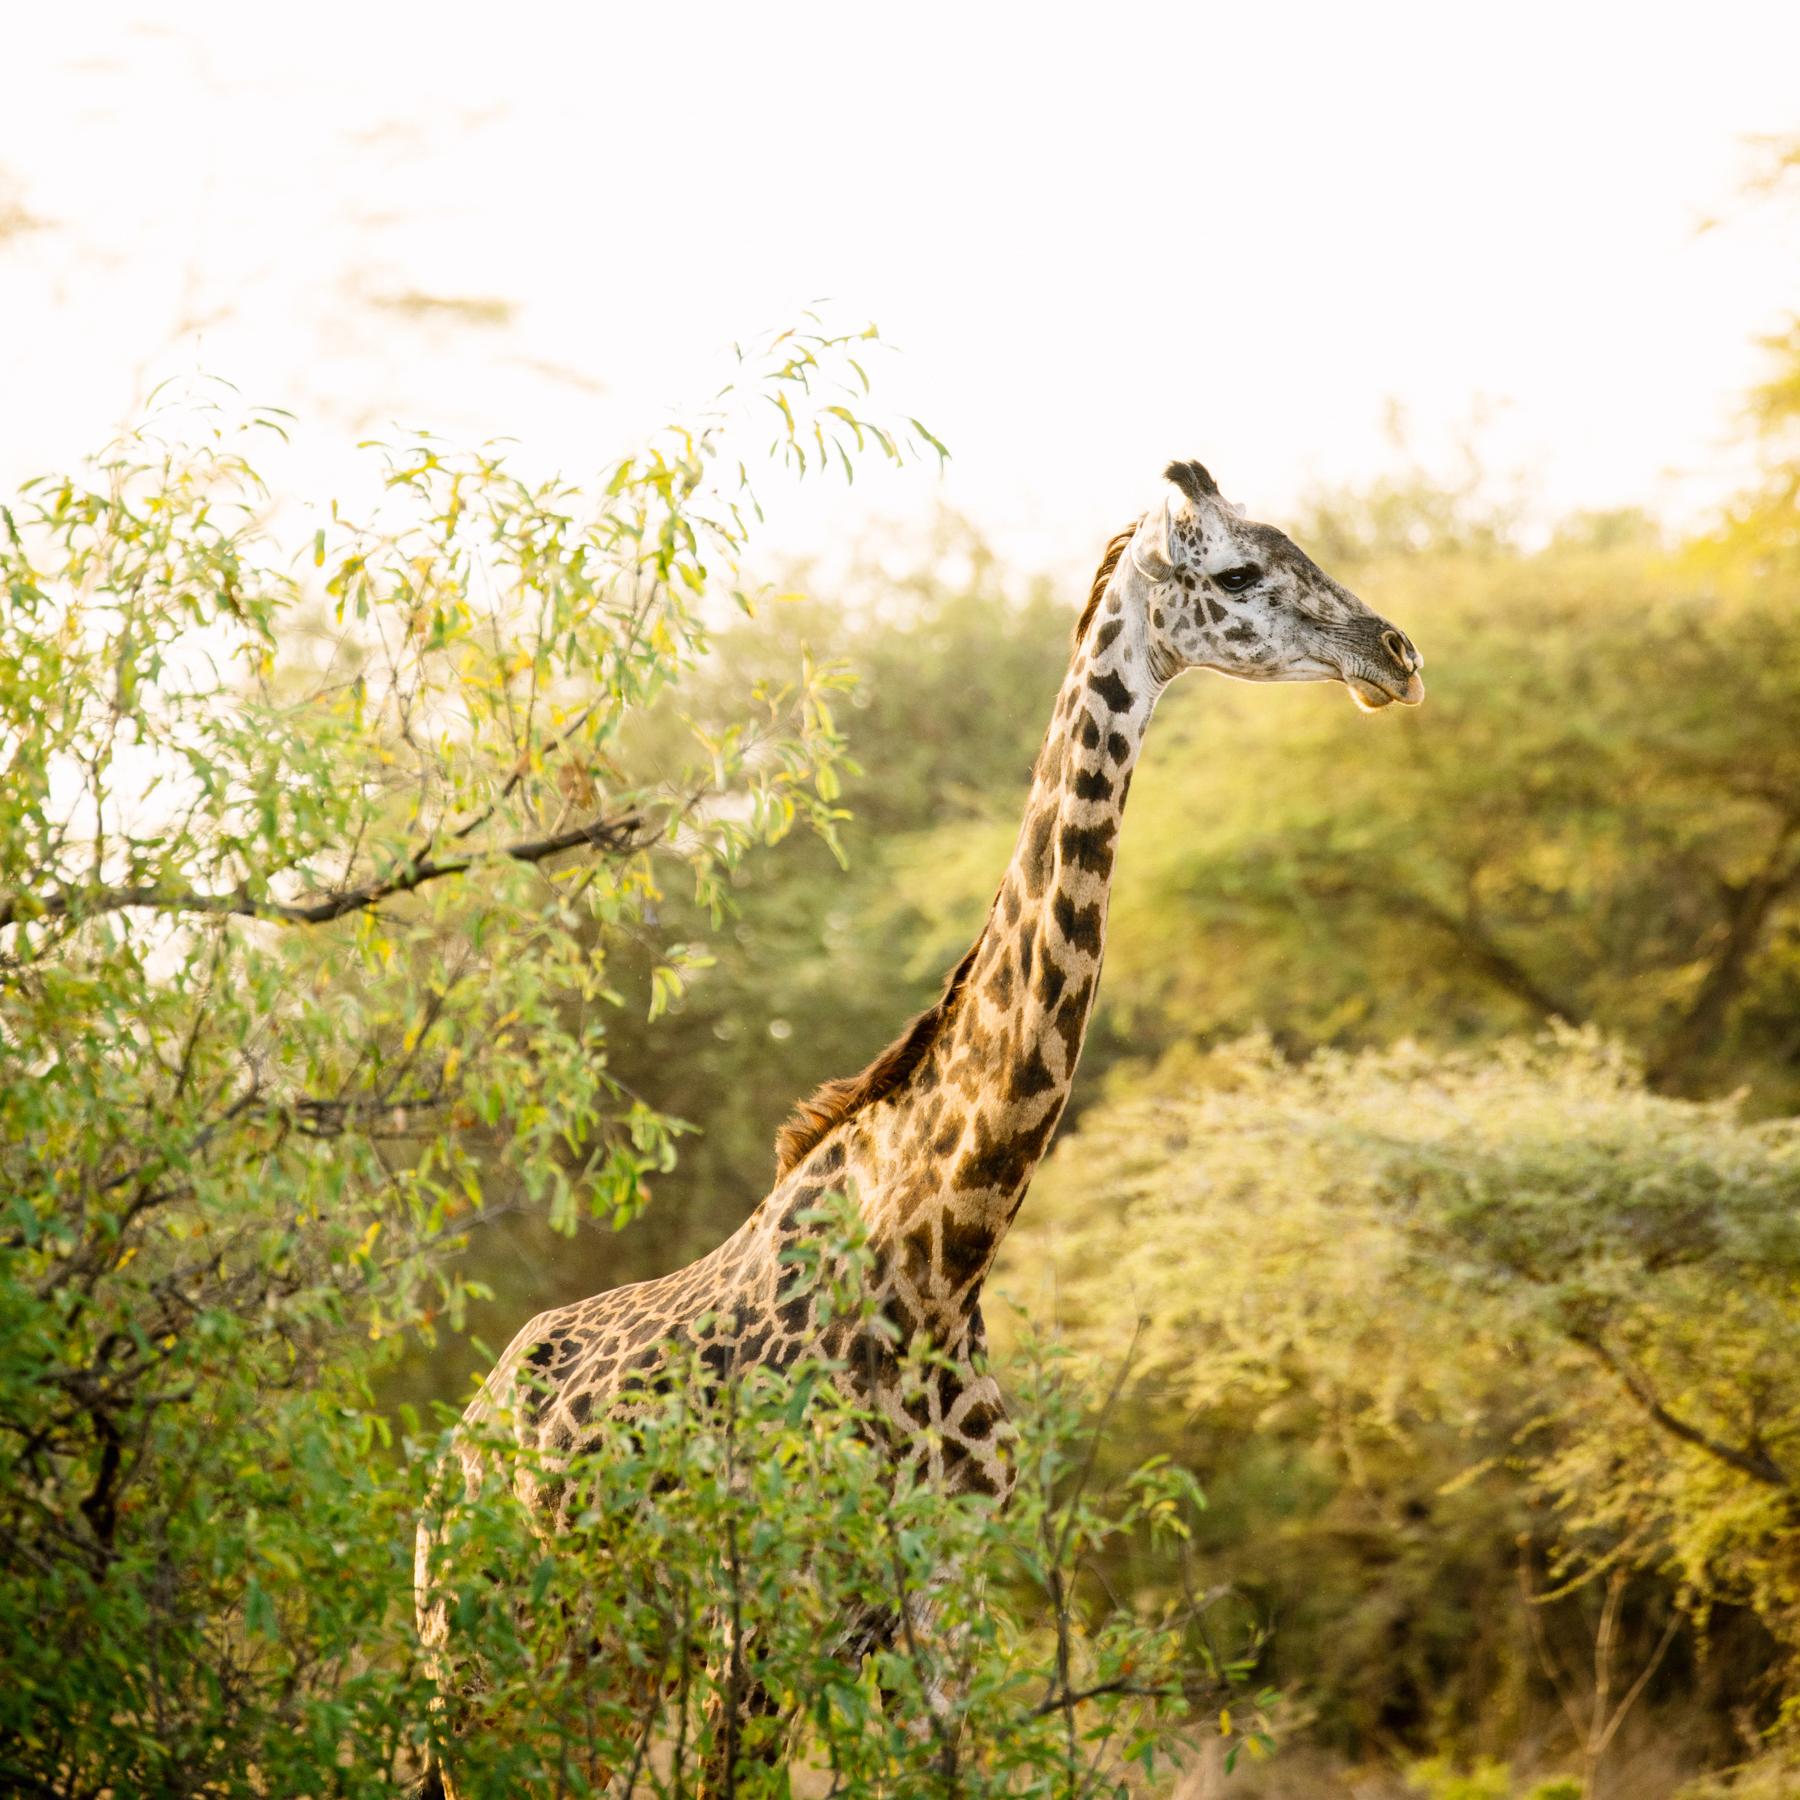 KenyaFeb2019_Safari-99.jpg